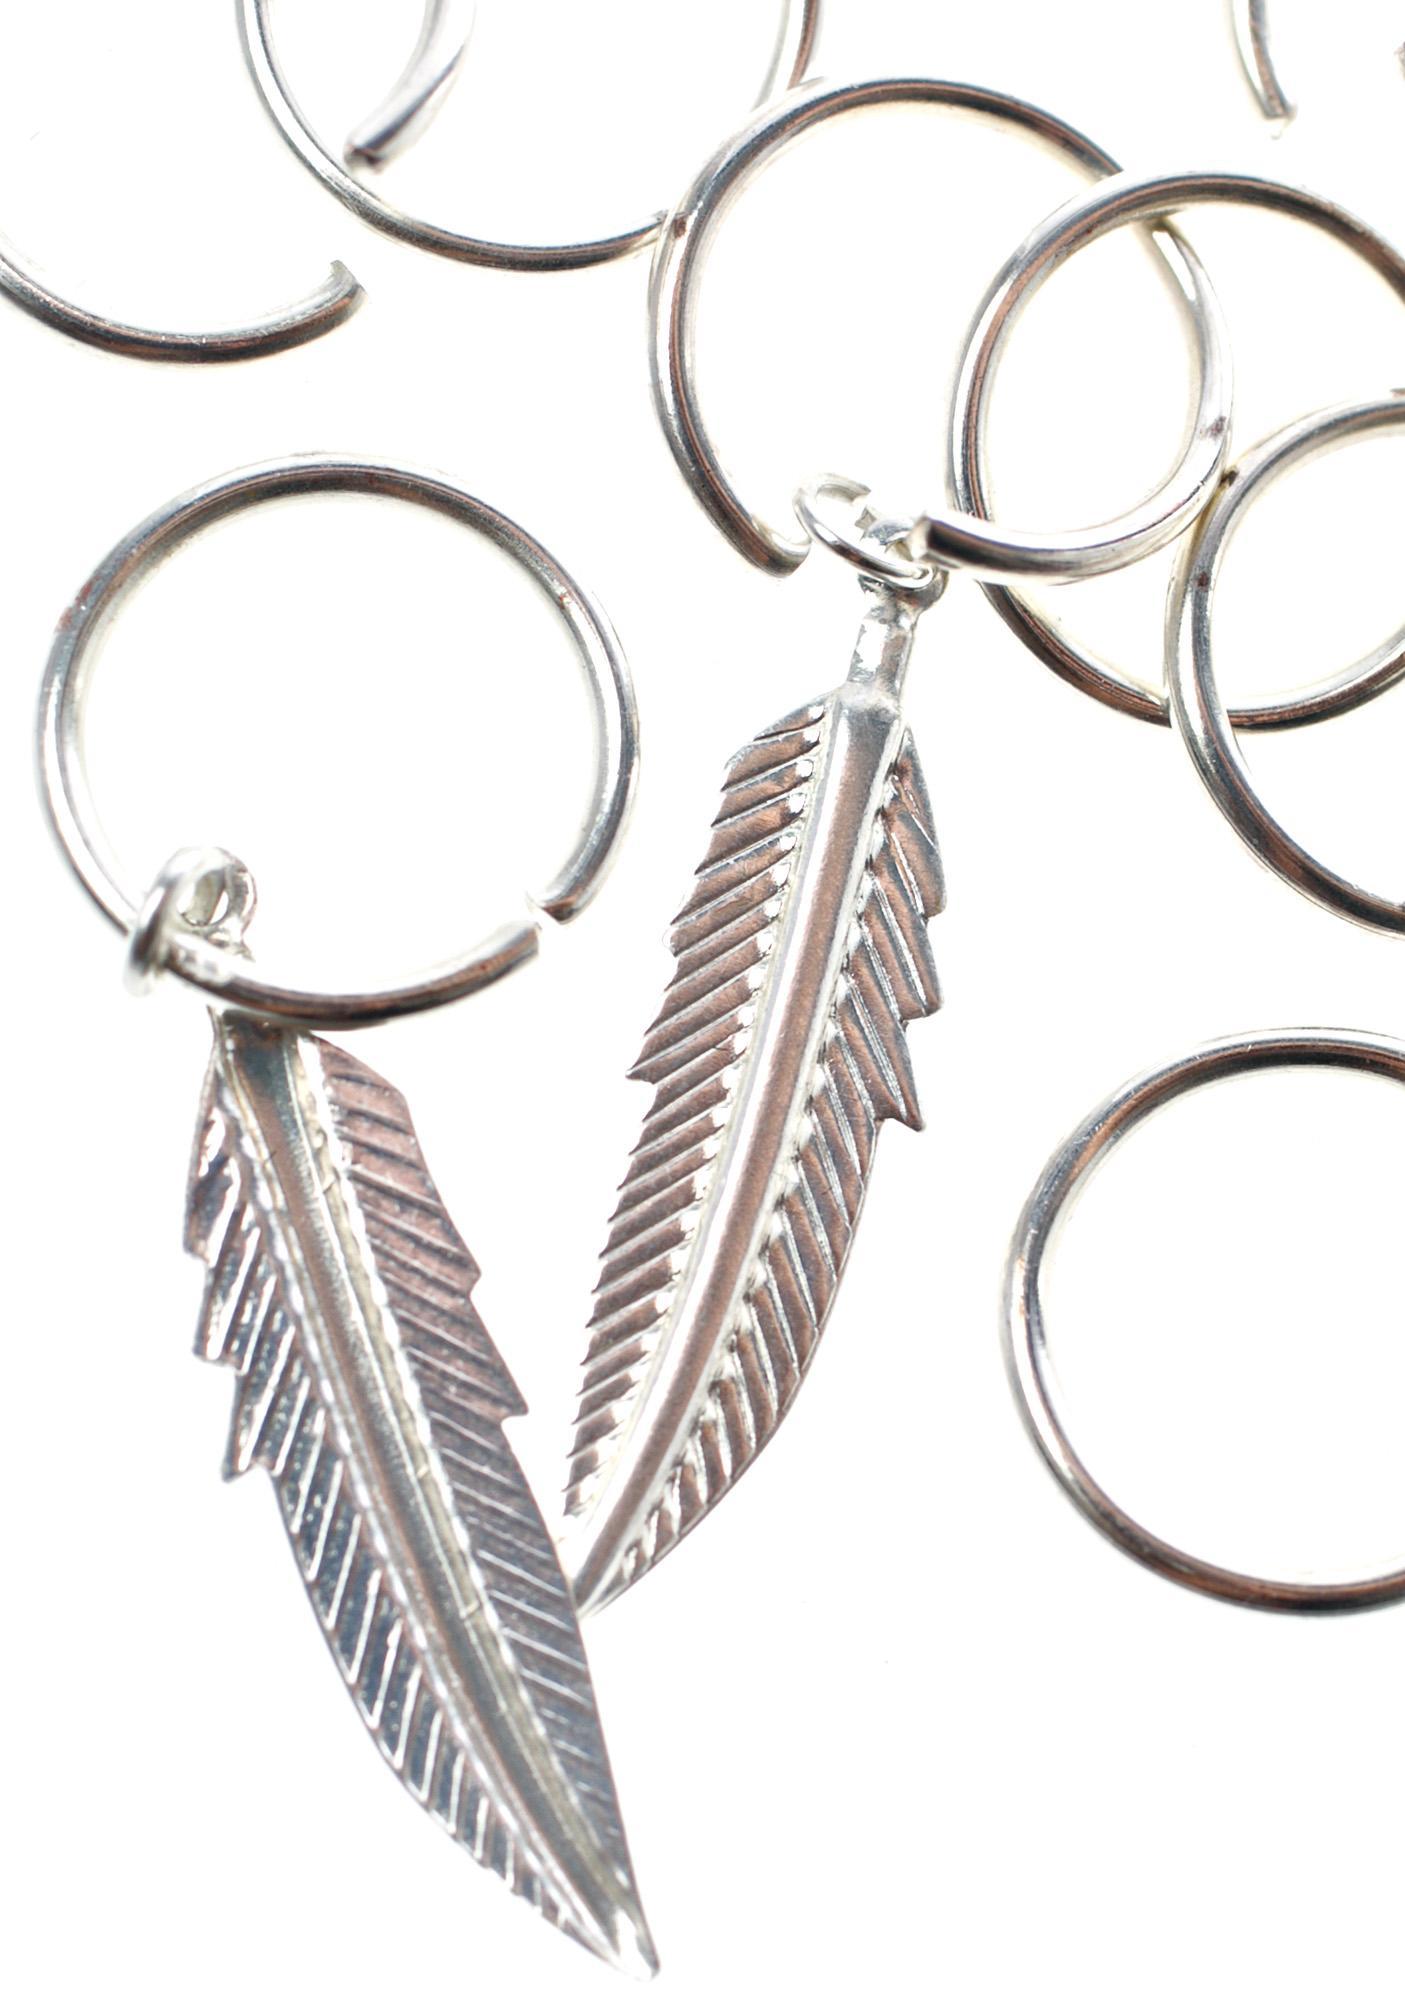 Faroe Feather Hair Rings